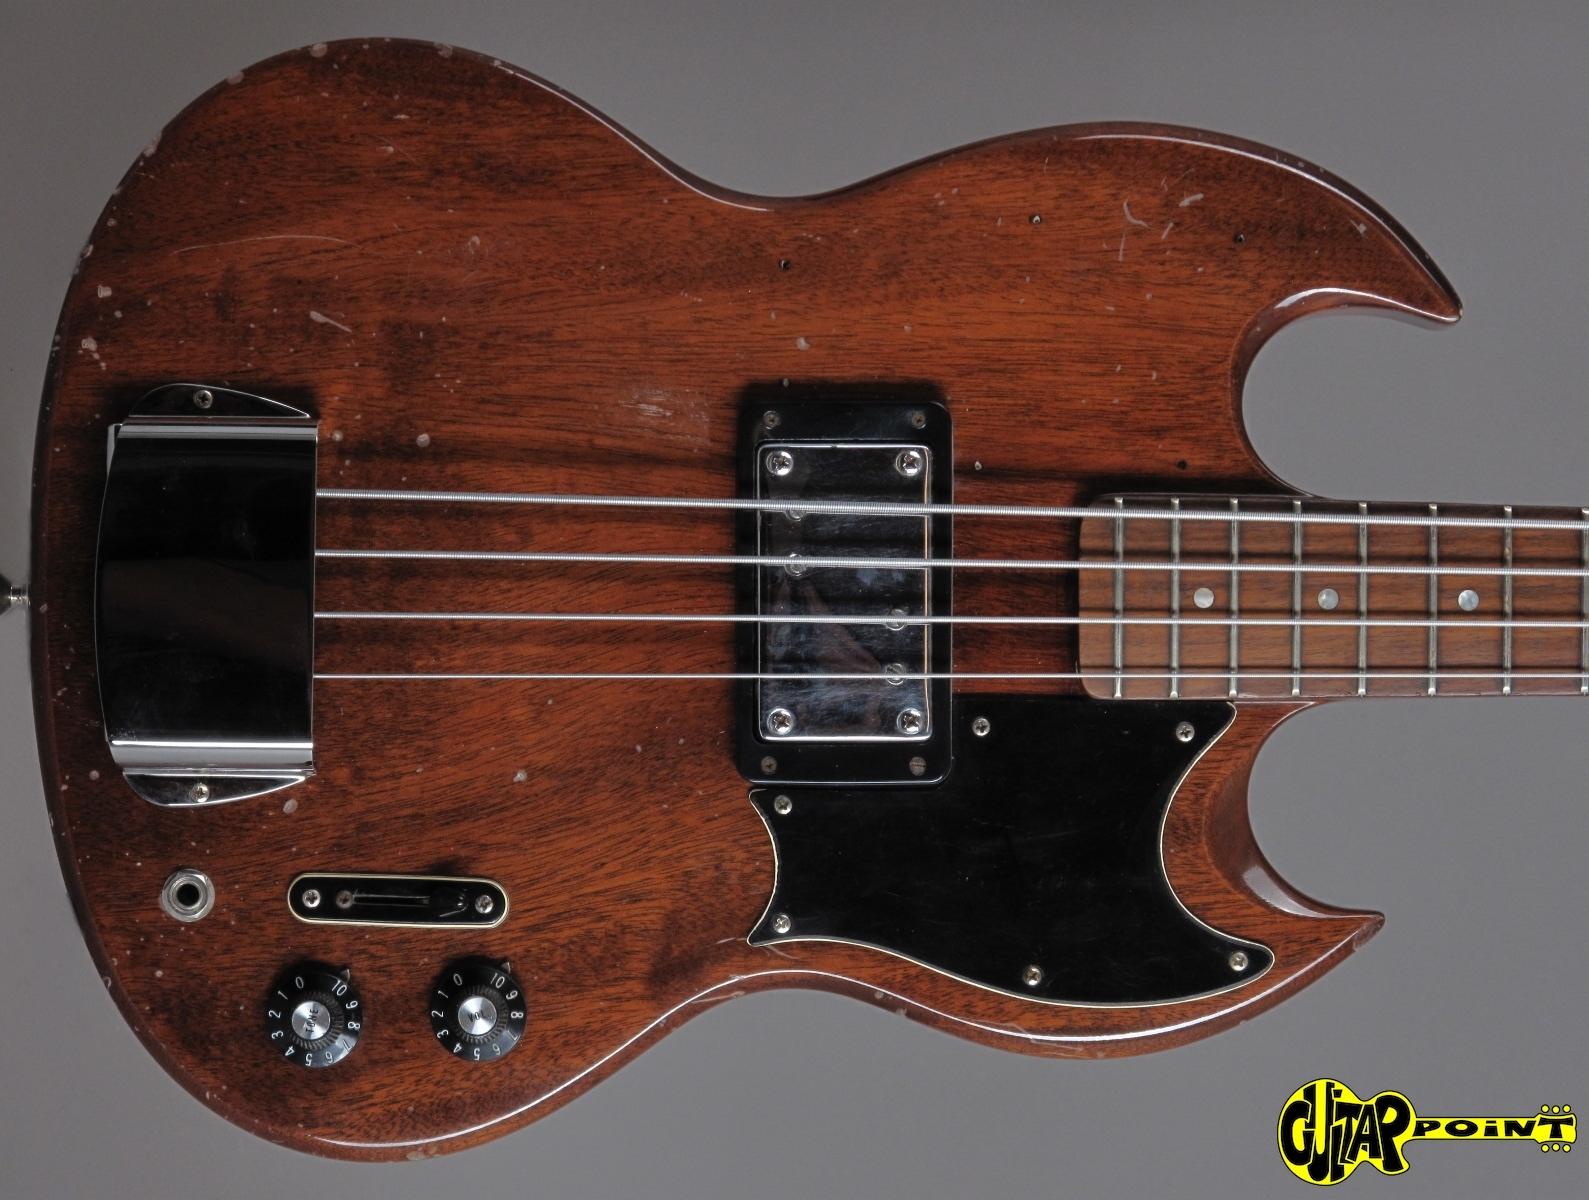 https://guitarpoint.de/app/uploads/products/1973-gibson-eb-4l-bass-natural/Gi73EB4L902021x_2q.jpg